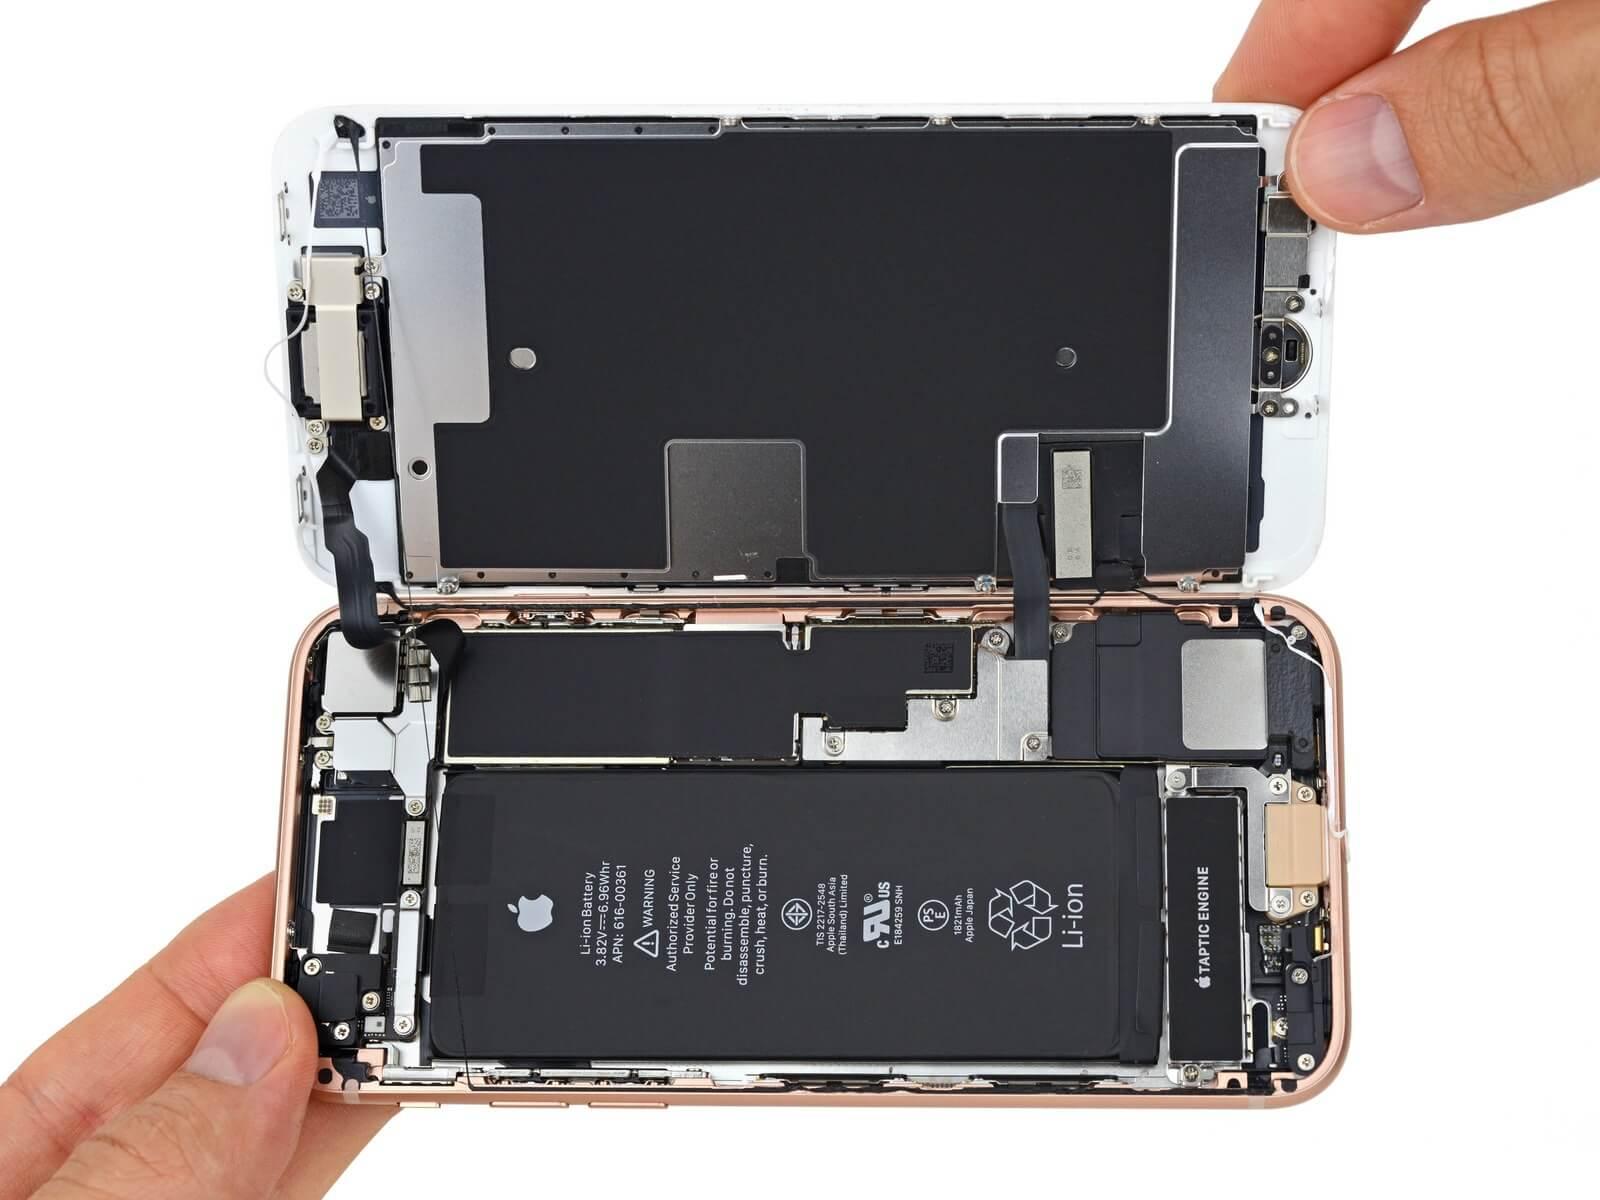 Teardown: So sieht Apples neues iPhone 8 von Innen aus - WinFuture.de